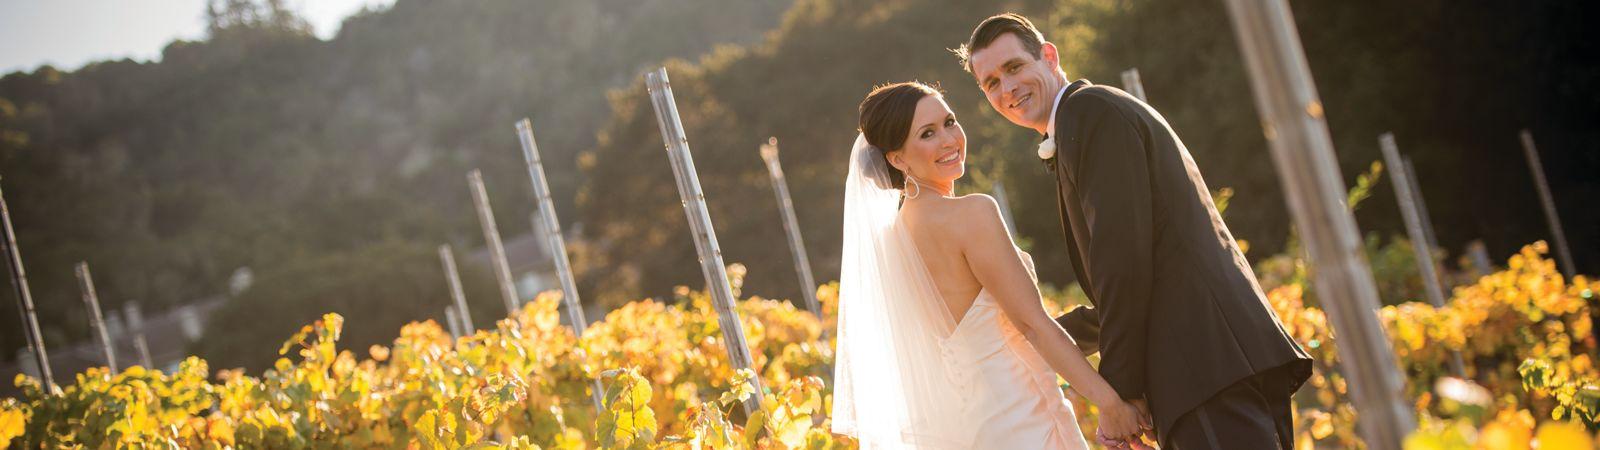 Carmel Valley Ranch_Wedings_wedding couple in fall vineyard